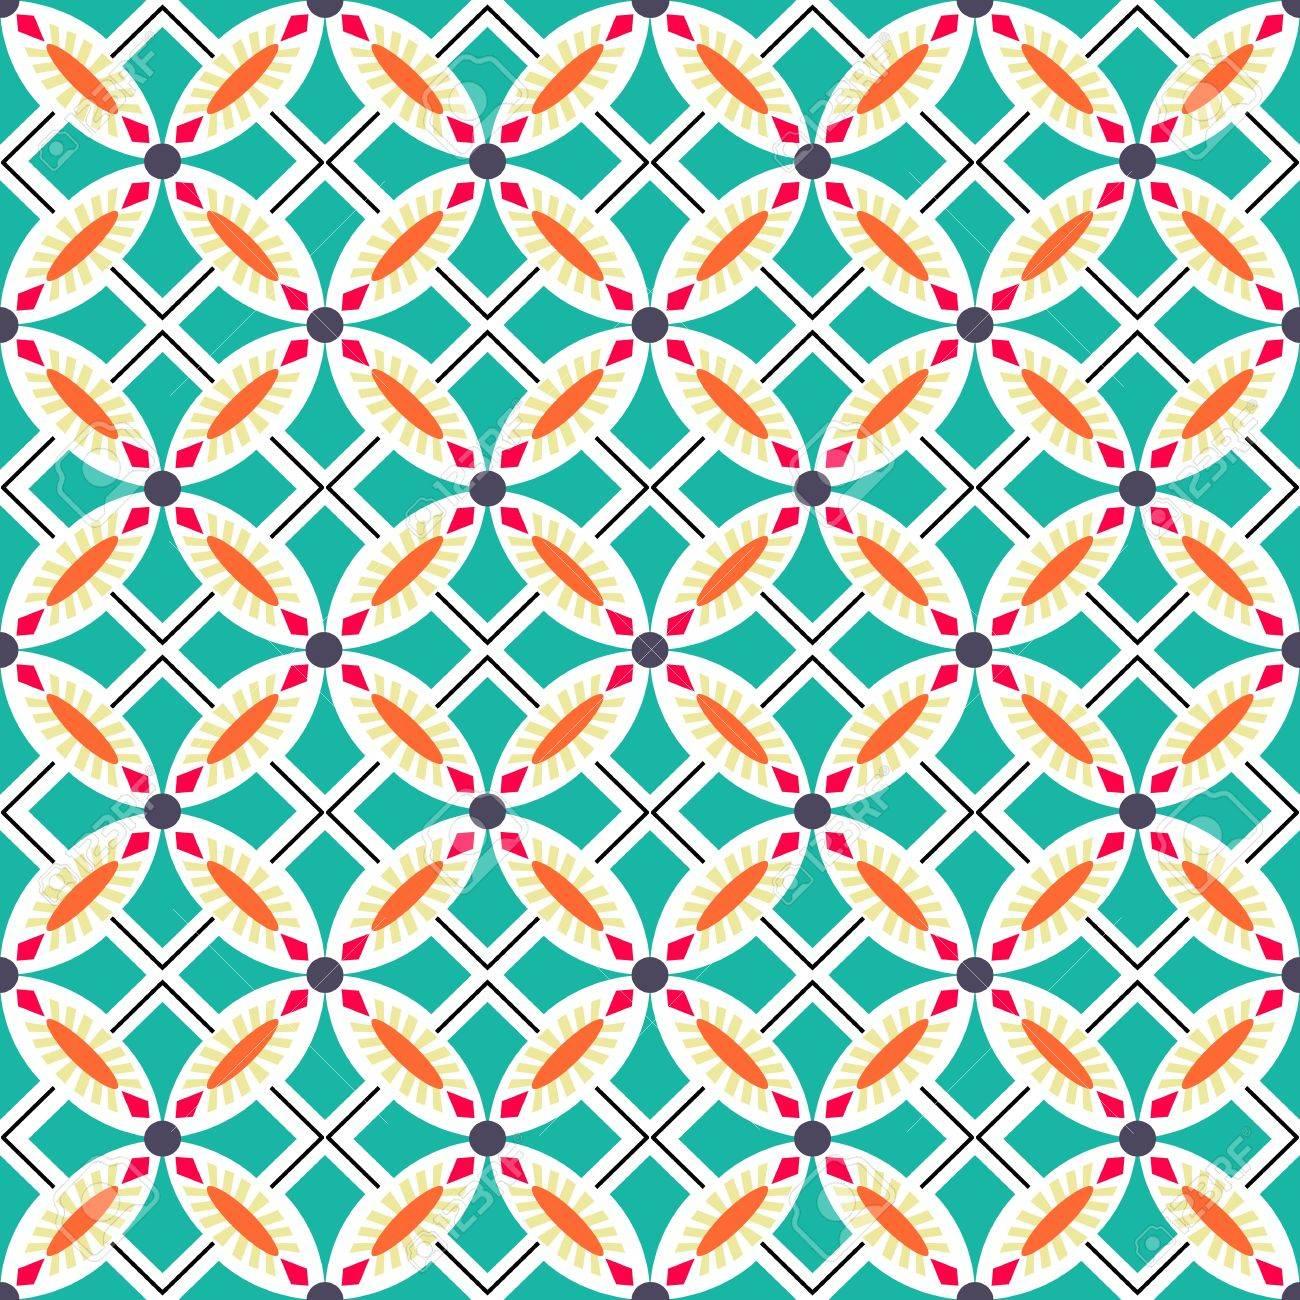 Beautiful seamless ornamental tile background illustration - 21747001